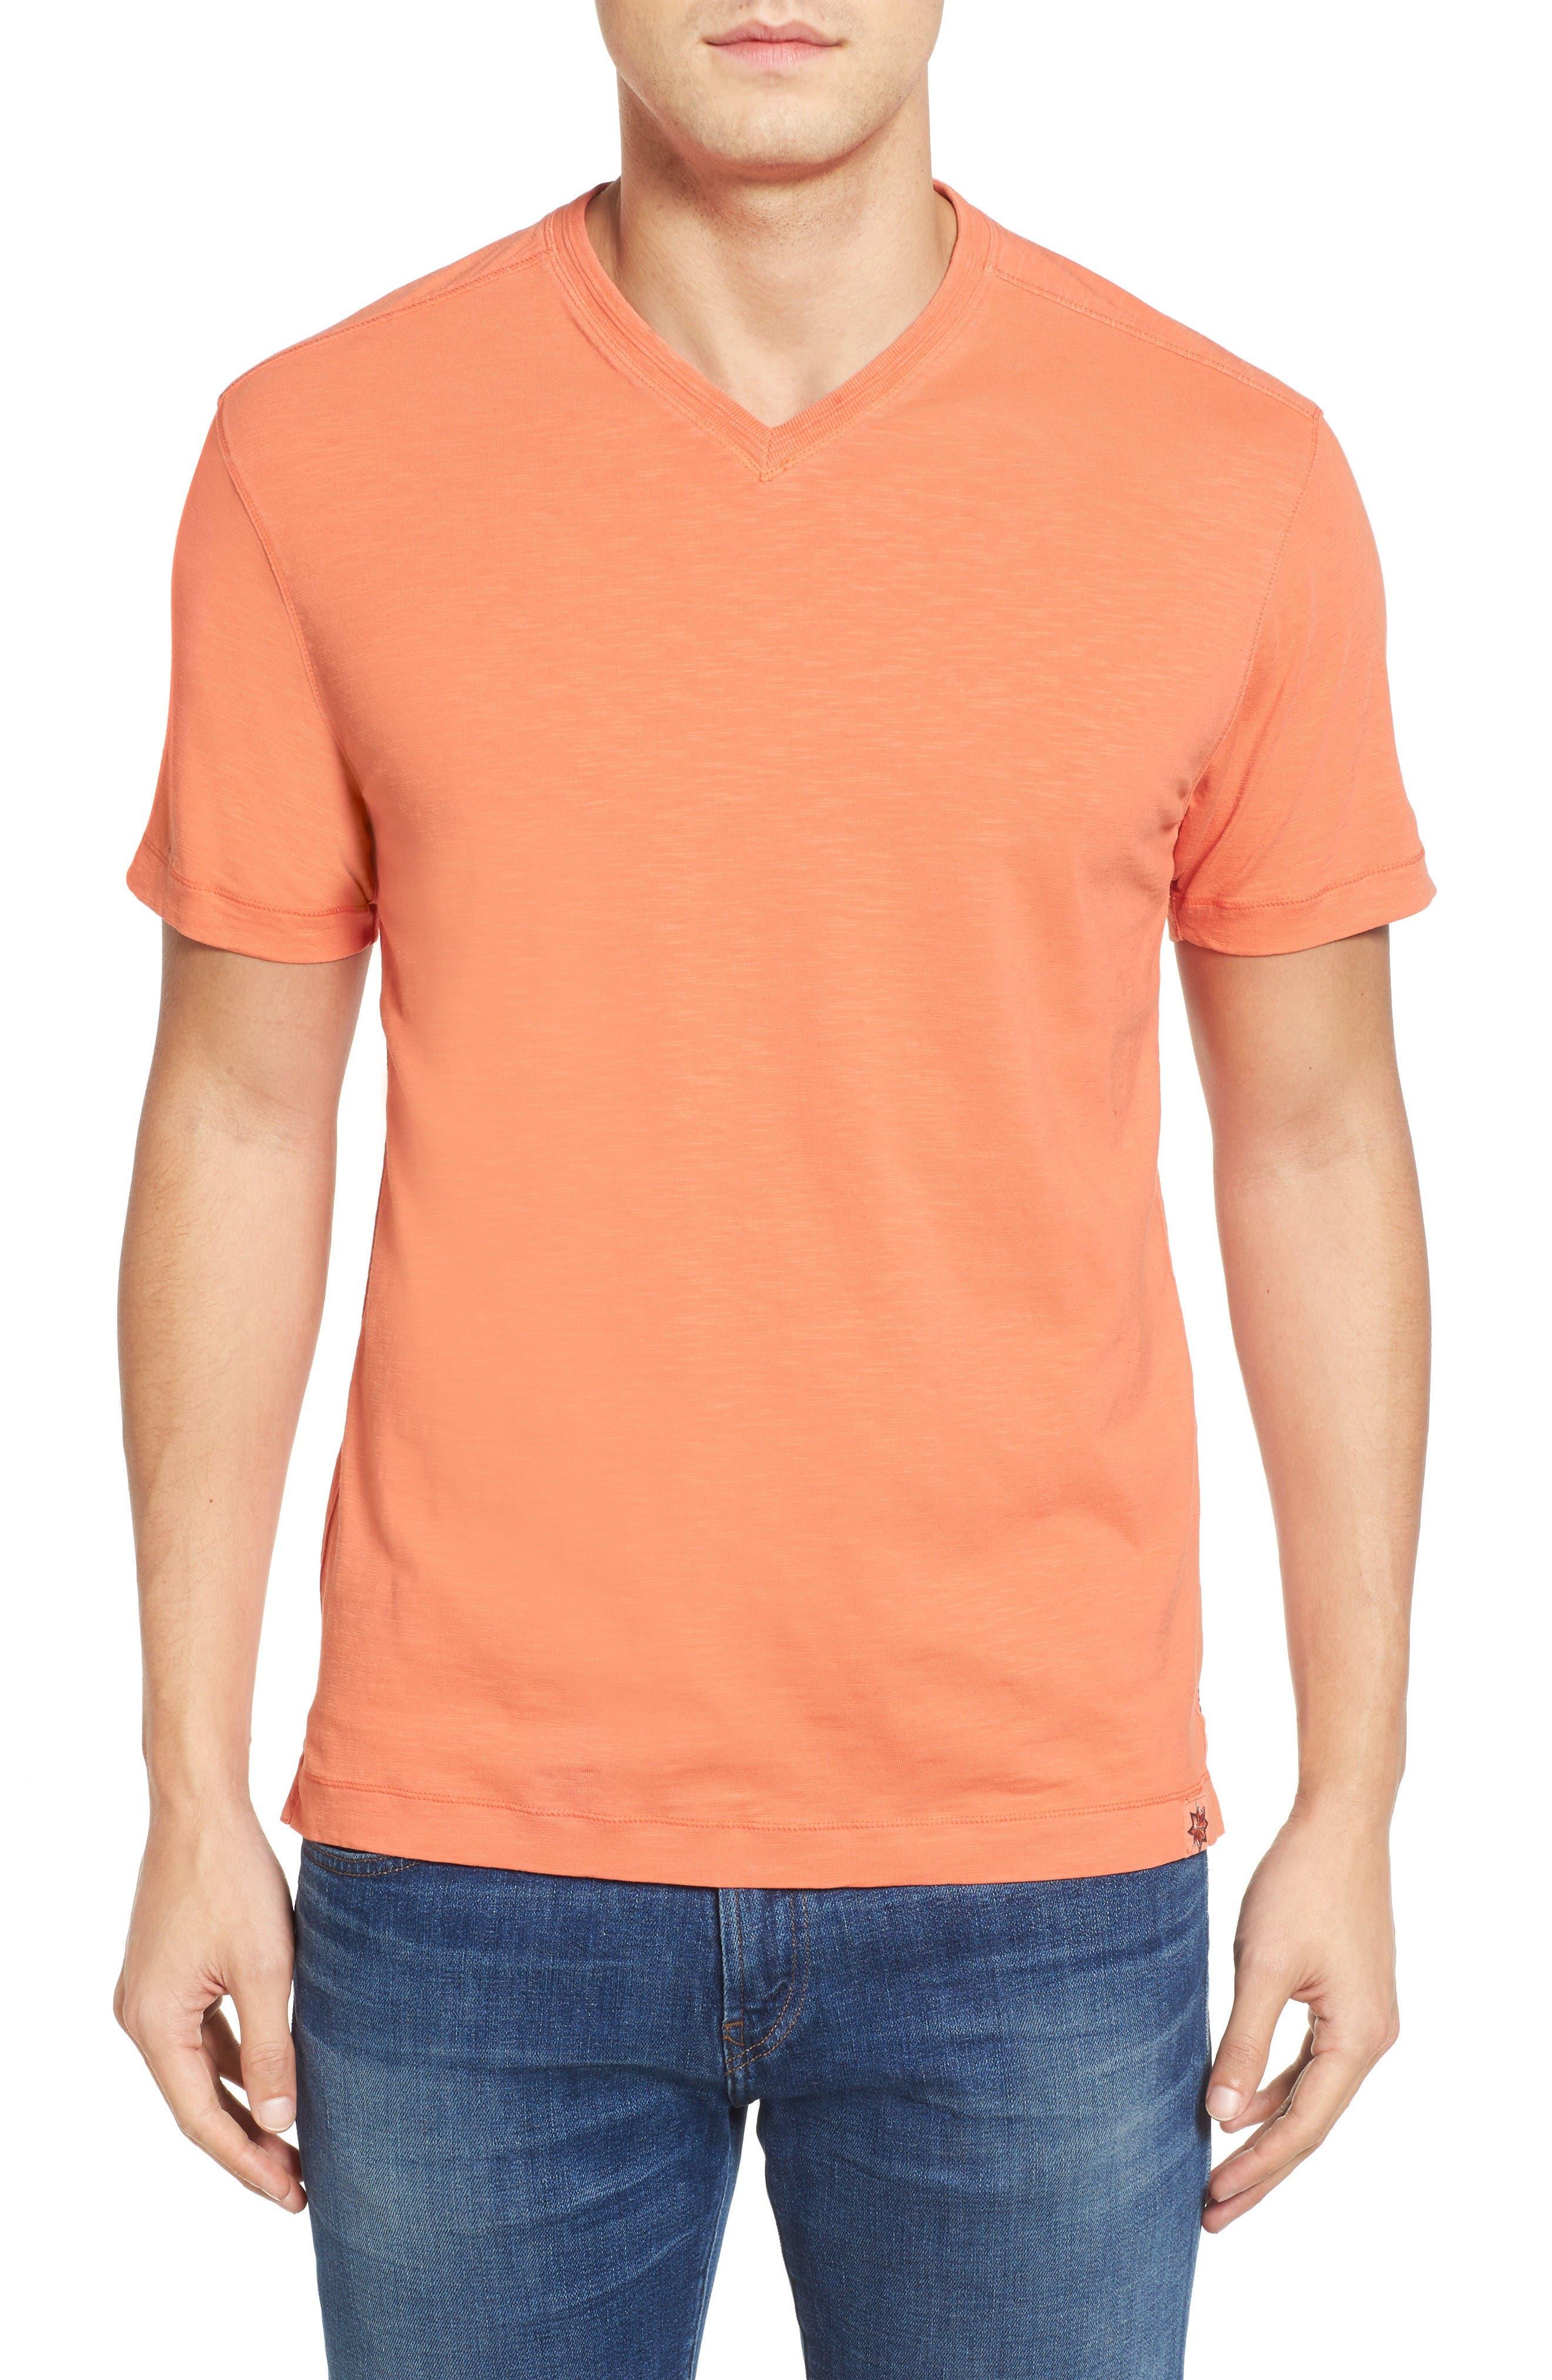 Thaddeus Virgil Stretch Jersey T-Shirt